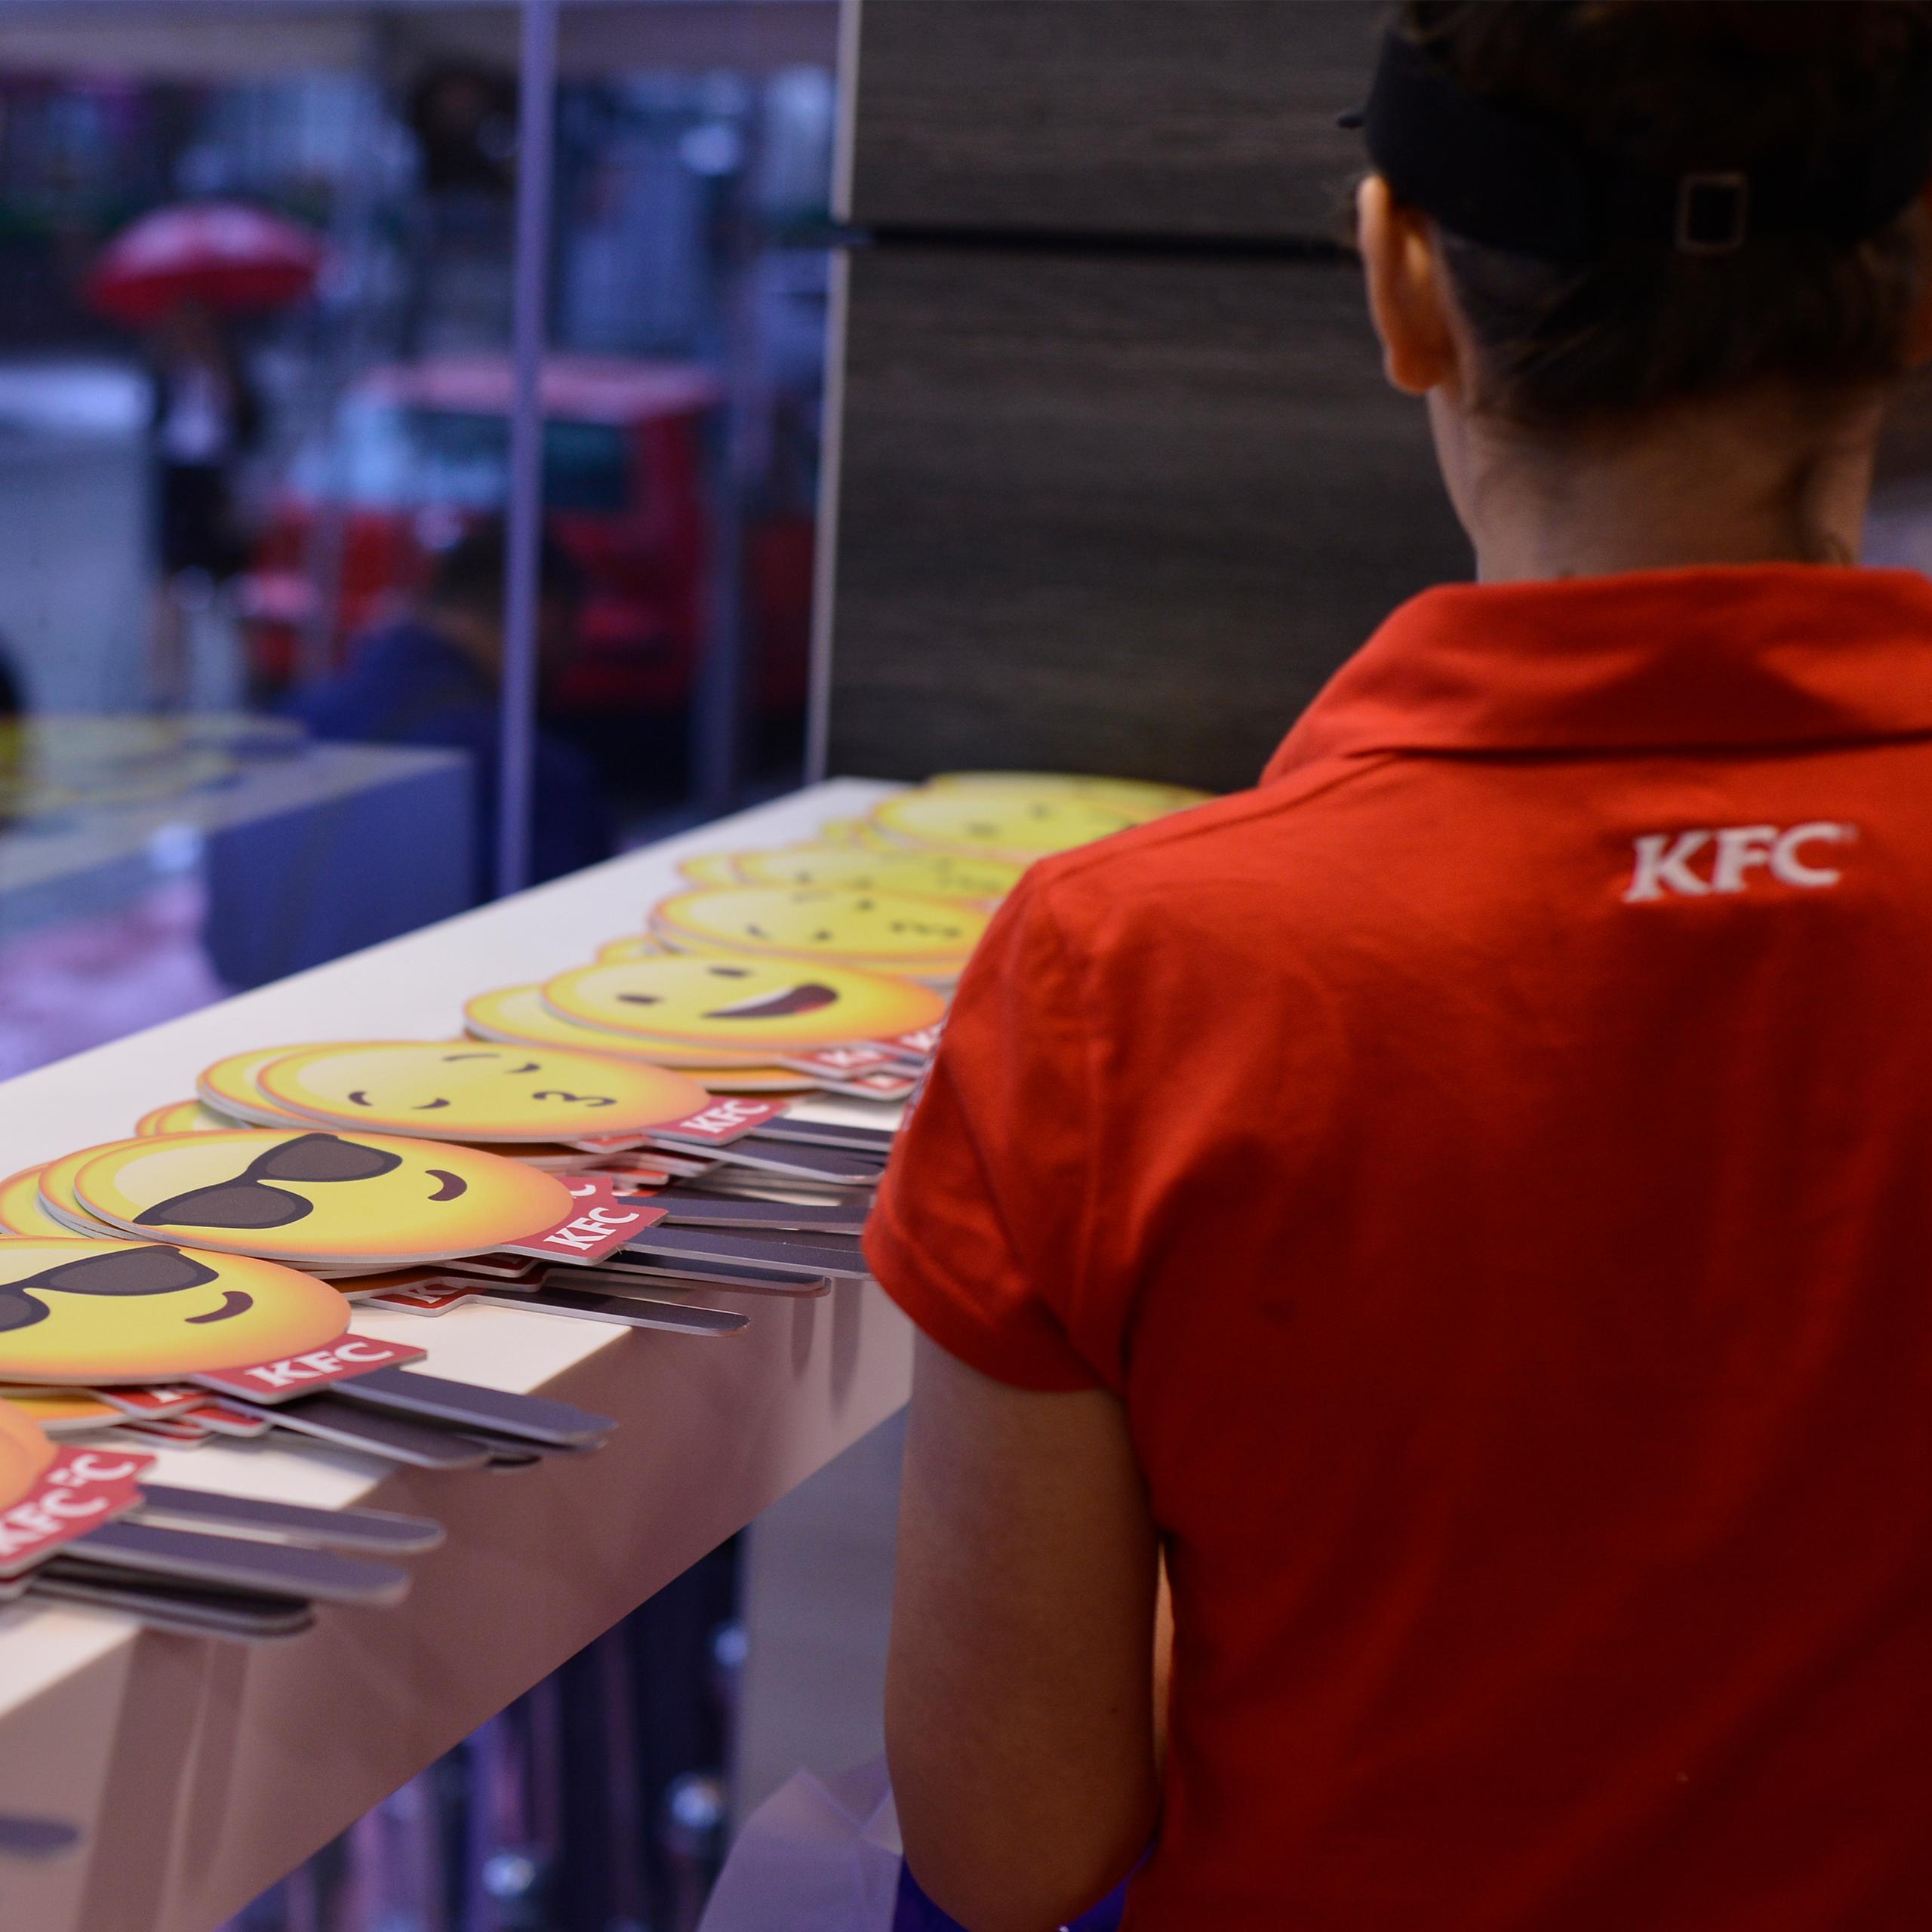 KFC, Social, Project Img 3 - Vatra Agency / Founder & CEO Gerton Bejo